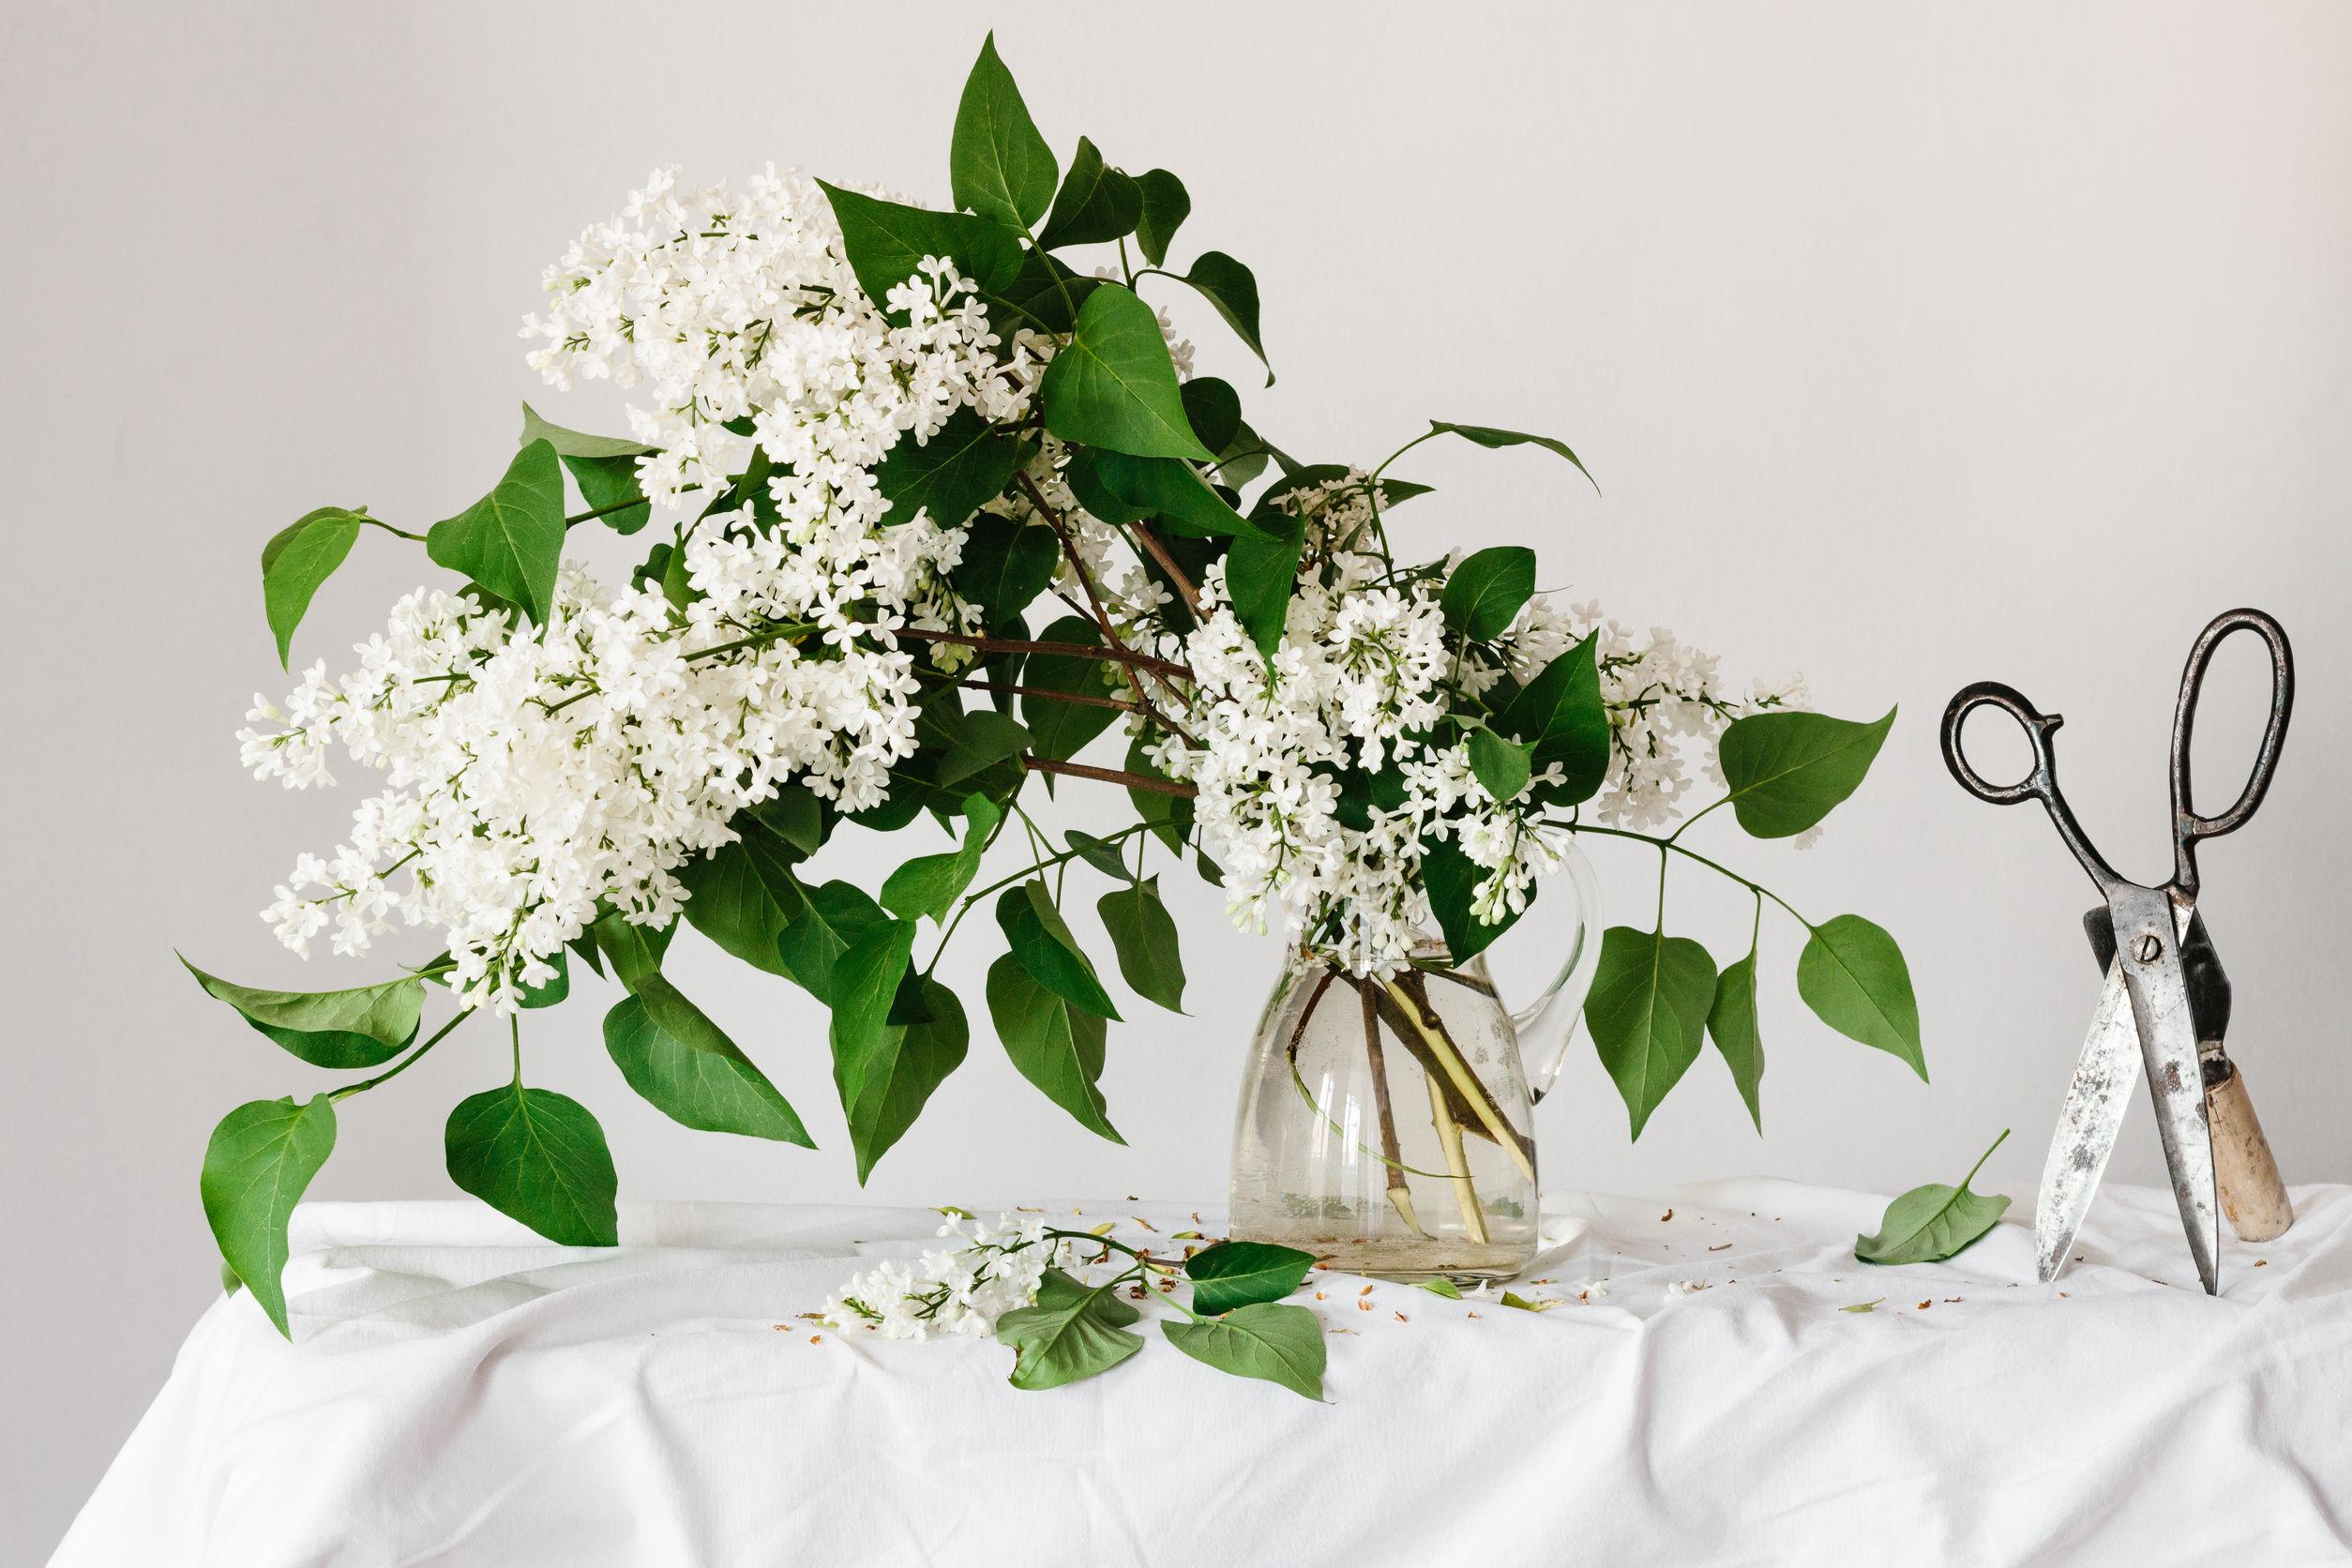 All4women Easy Budget Friendly Spring Flower Arrangement Ideas